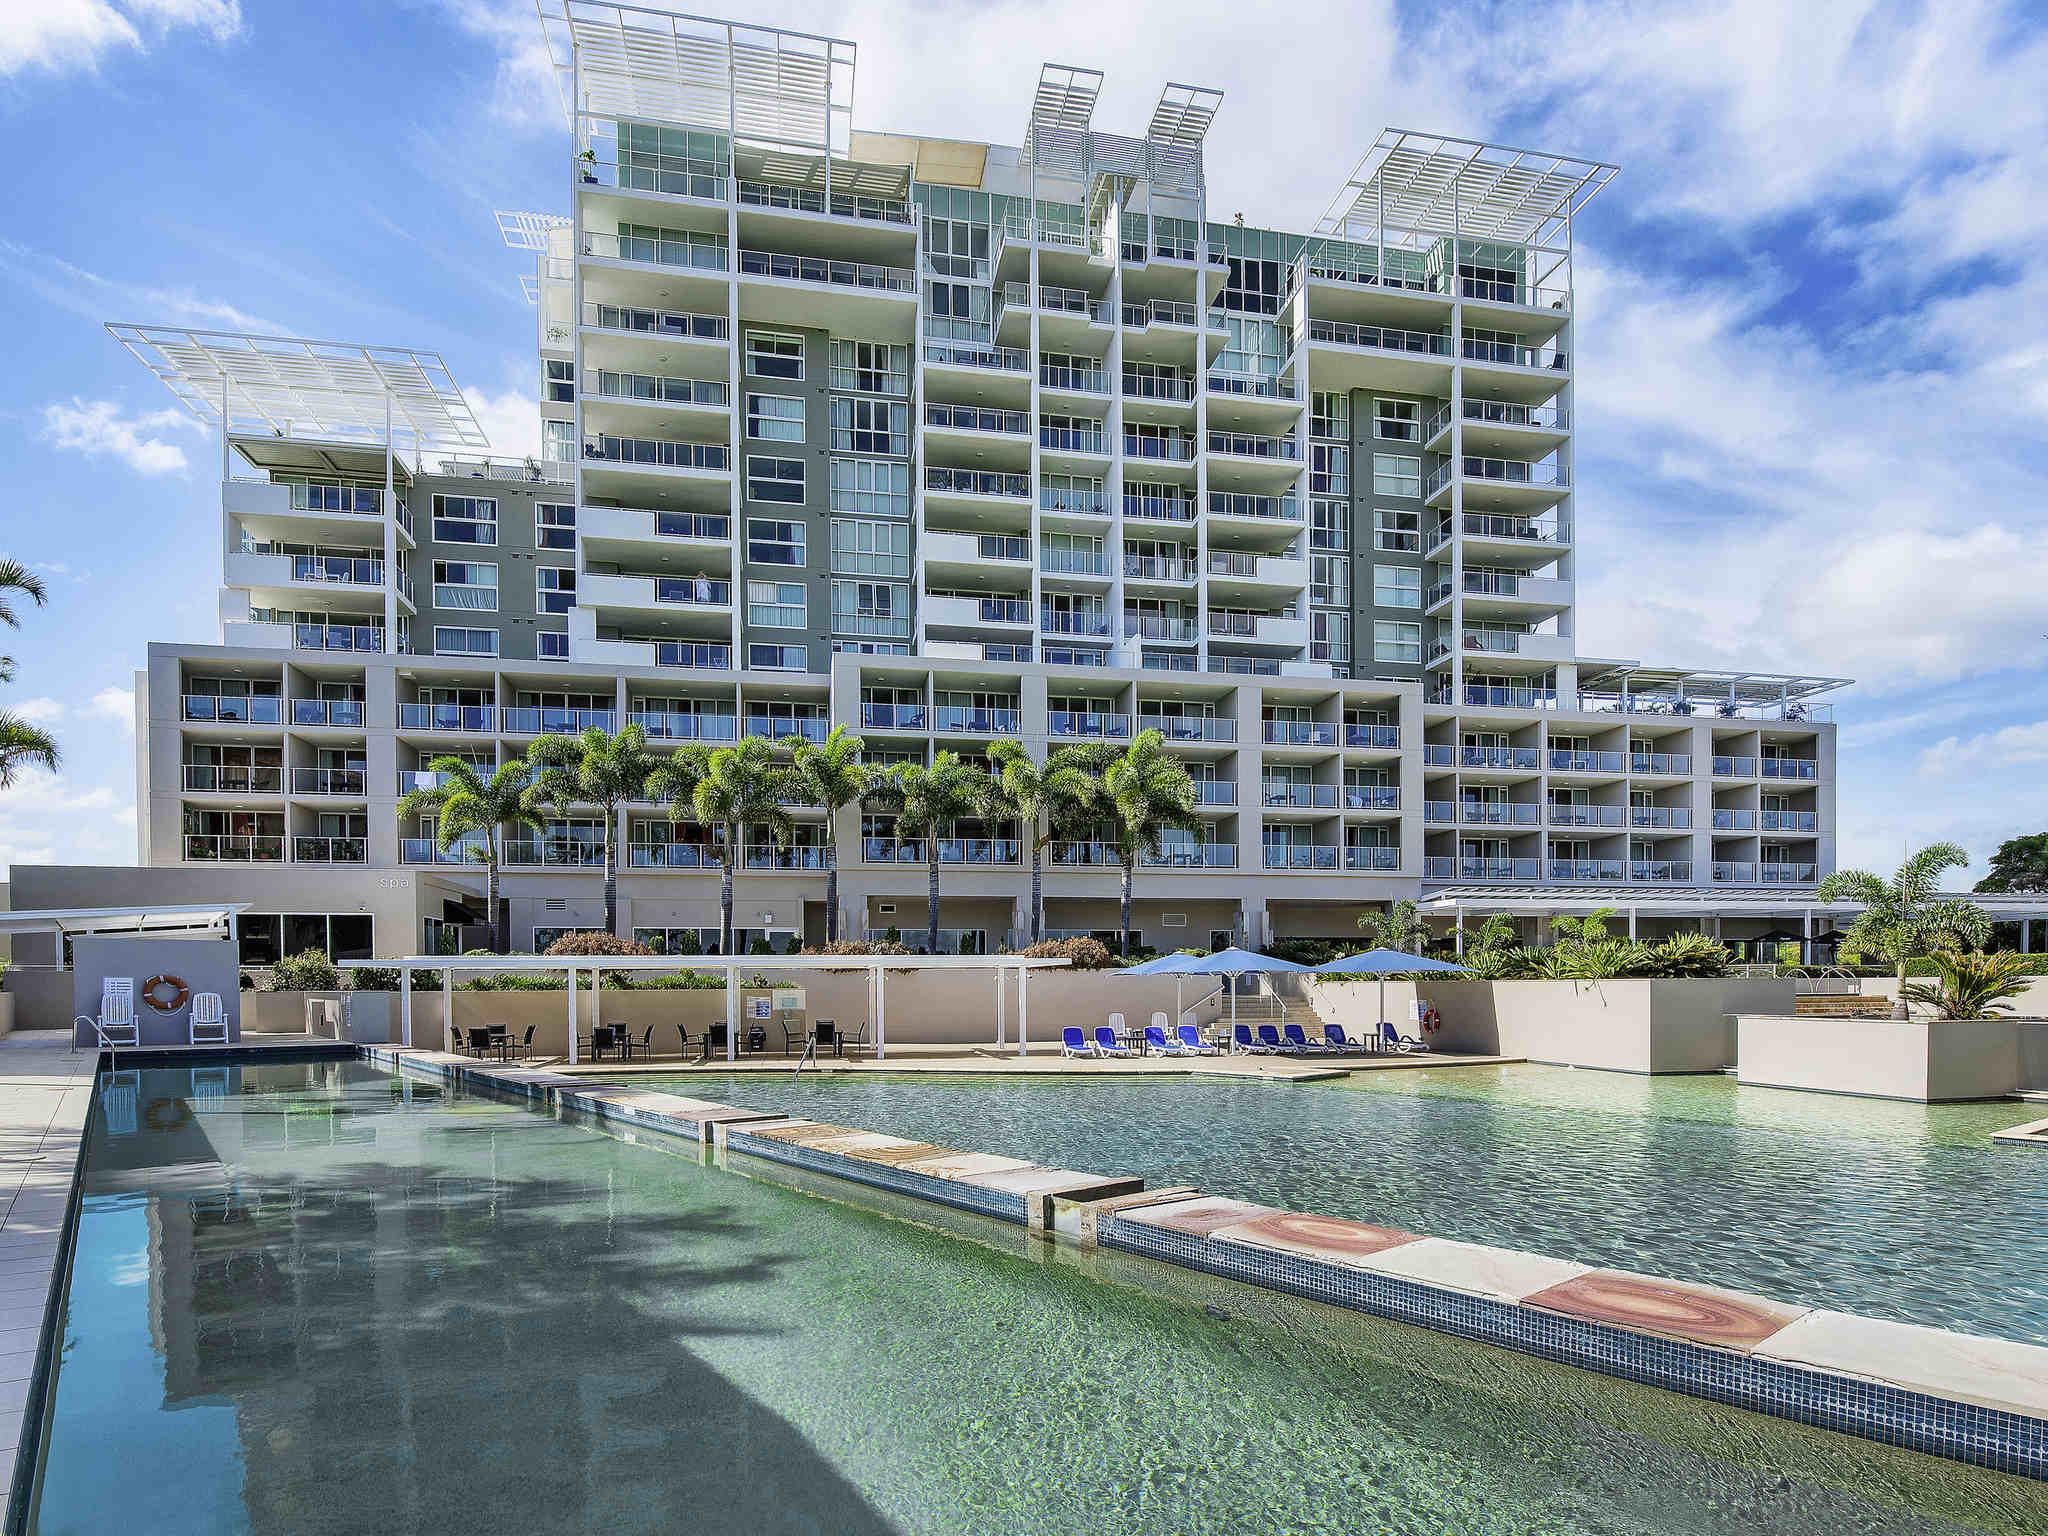 Hotell – The Sebel Pelican Waters Resort